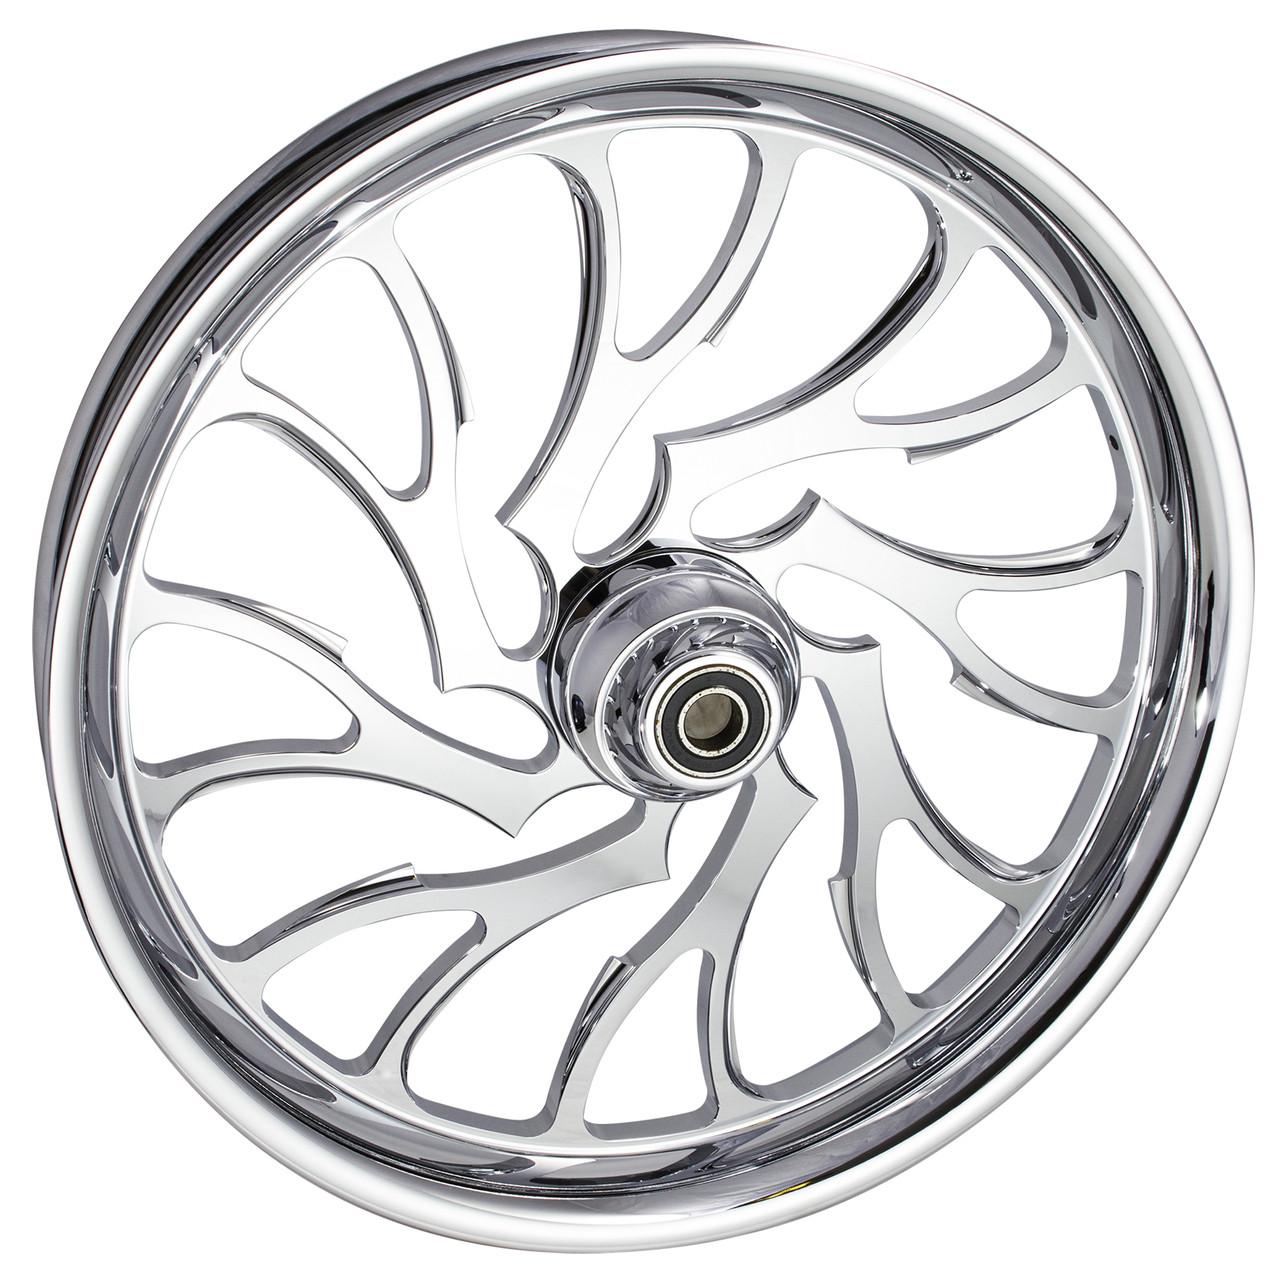 Chrome Harley Davidson Trike and Freewheeler Wheels